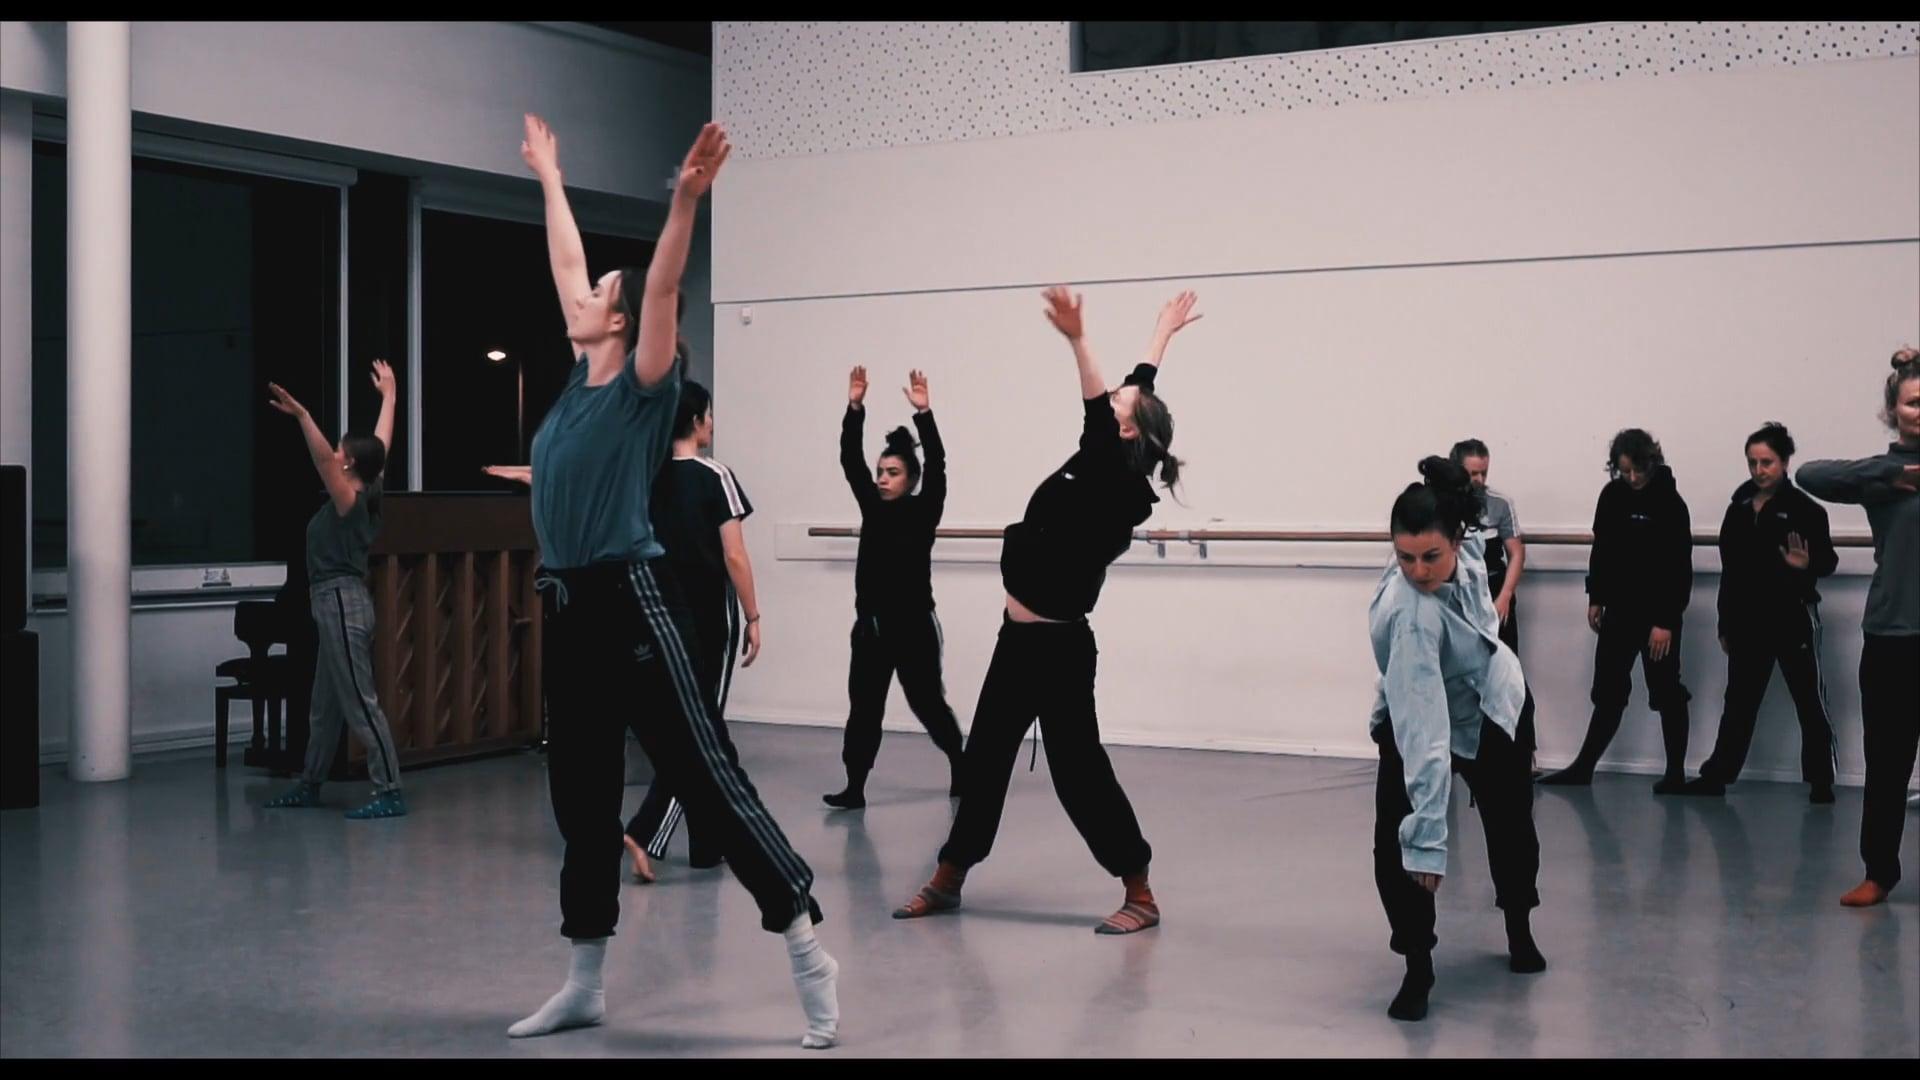 Justine Doswell  Dance Ireland Residency Dec 16-19 2019